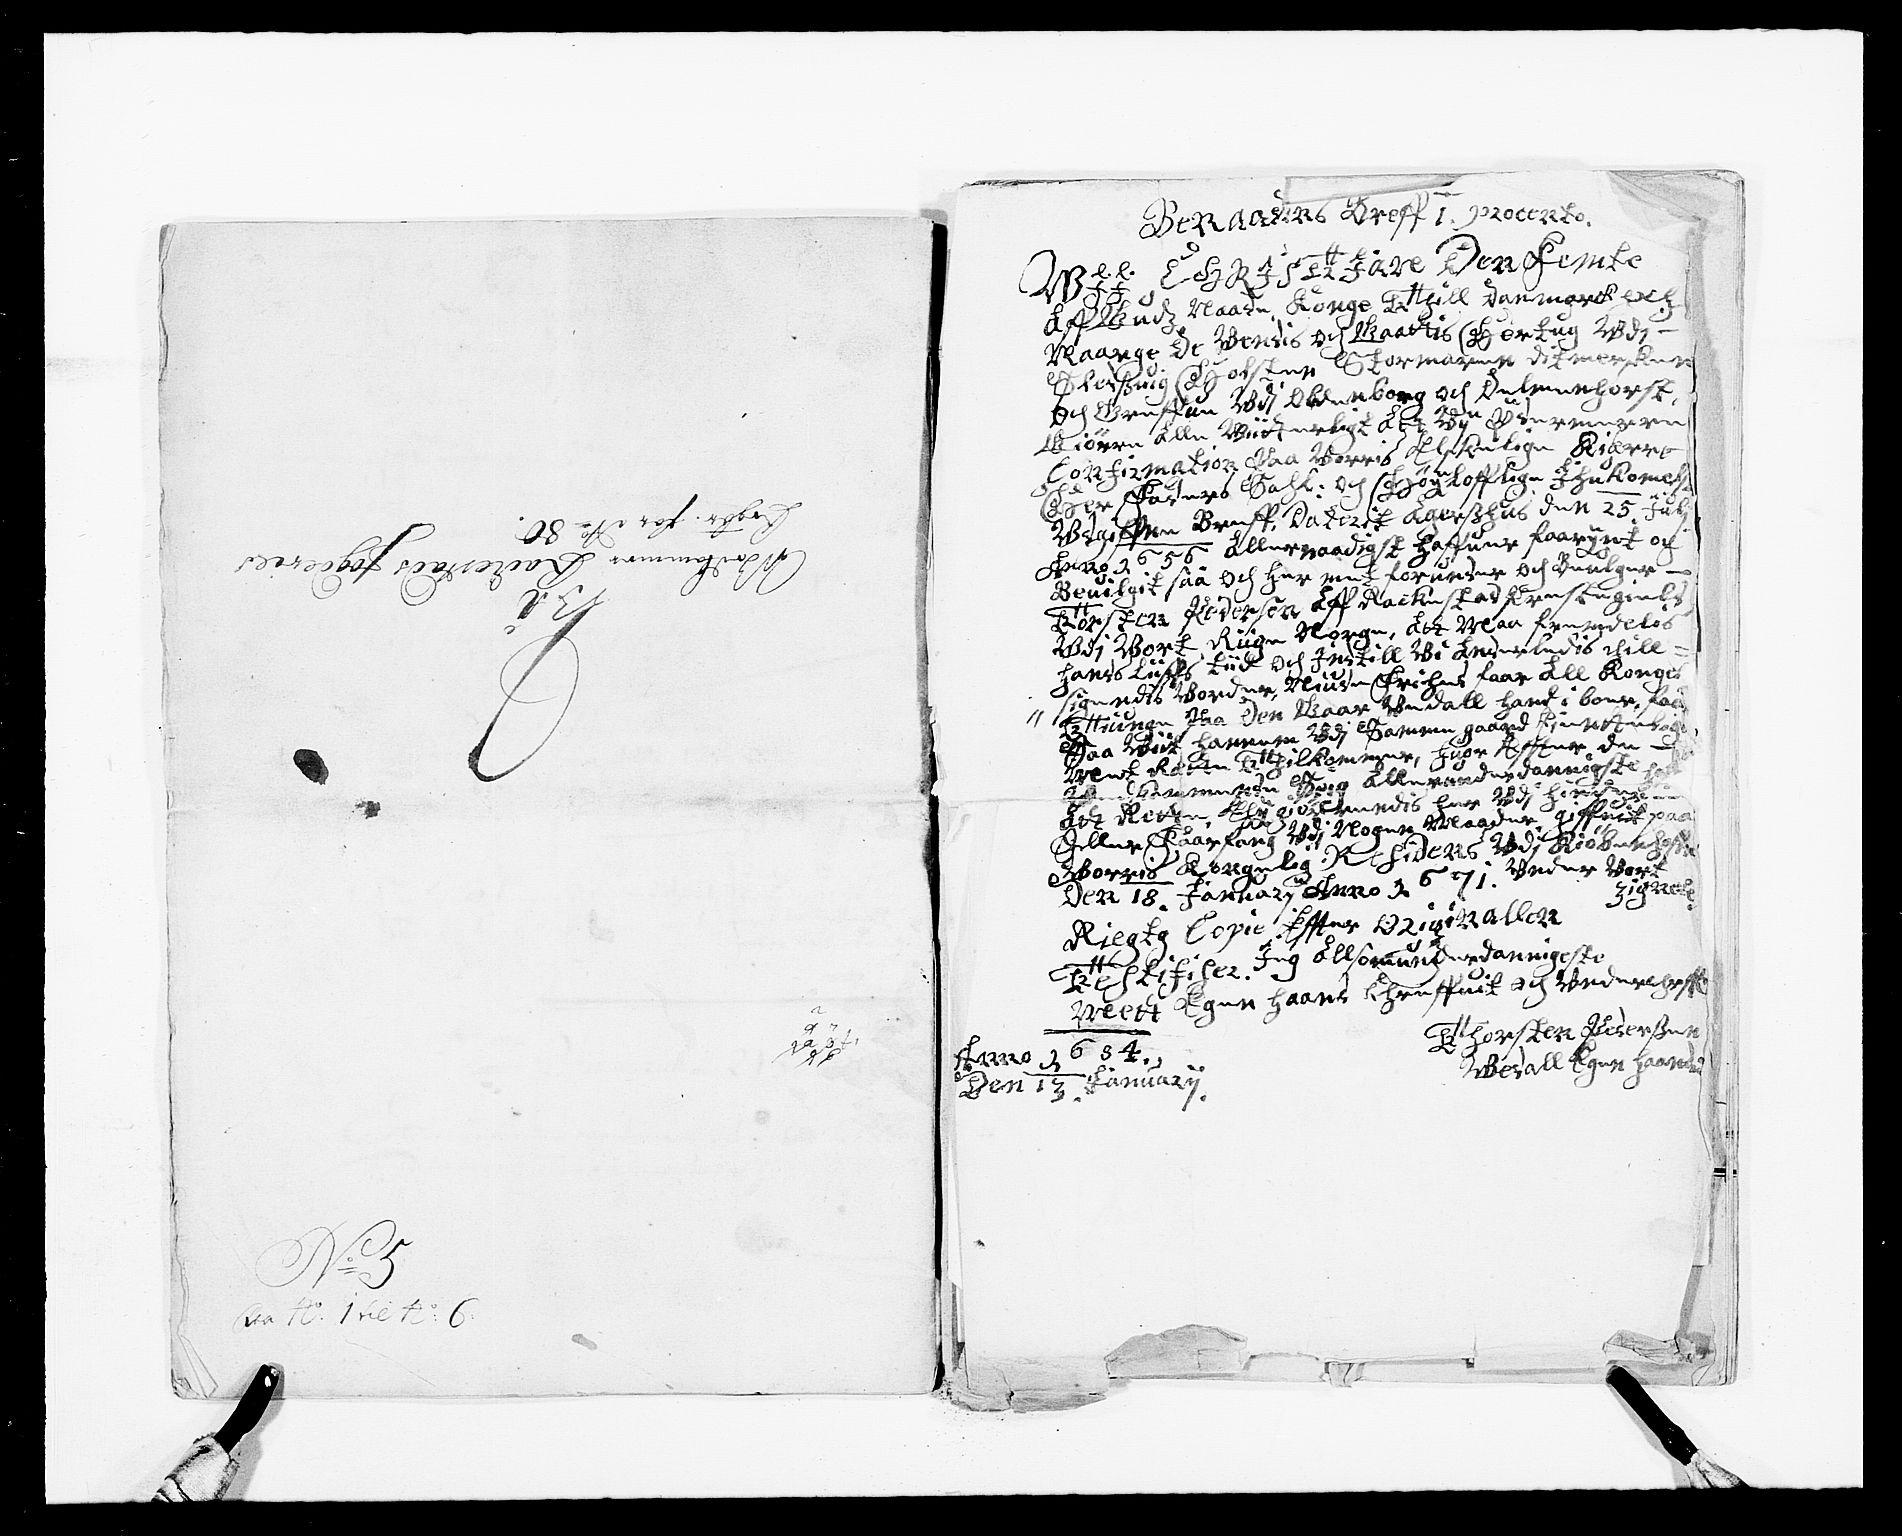 RA, Rentekammeret inntil 1814, Reviderte regnskaper, Fogderegnskap, R05/L0272: Fogderegnskap Rakkestad, 1680-1681, s. 416